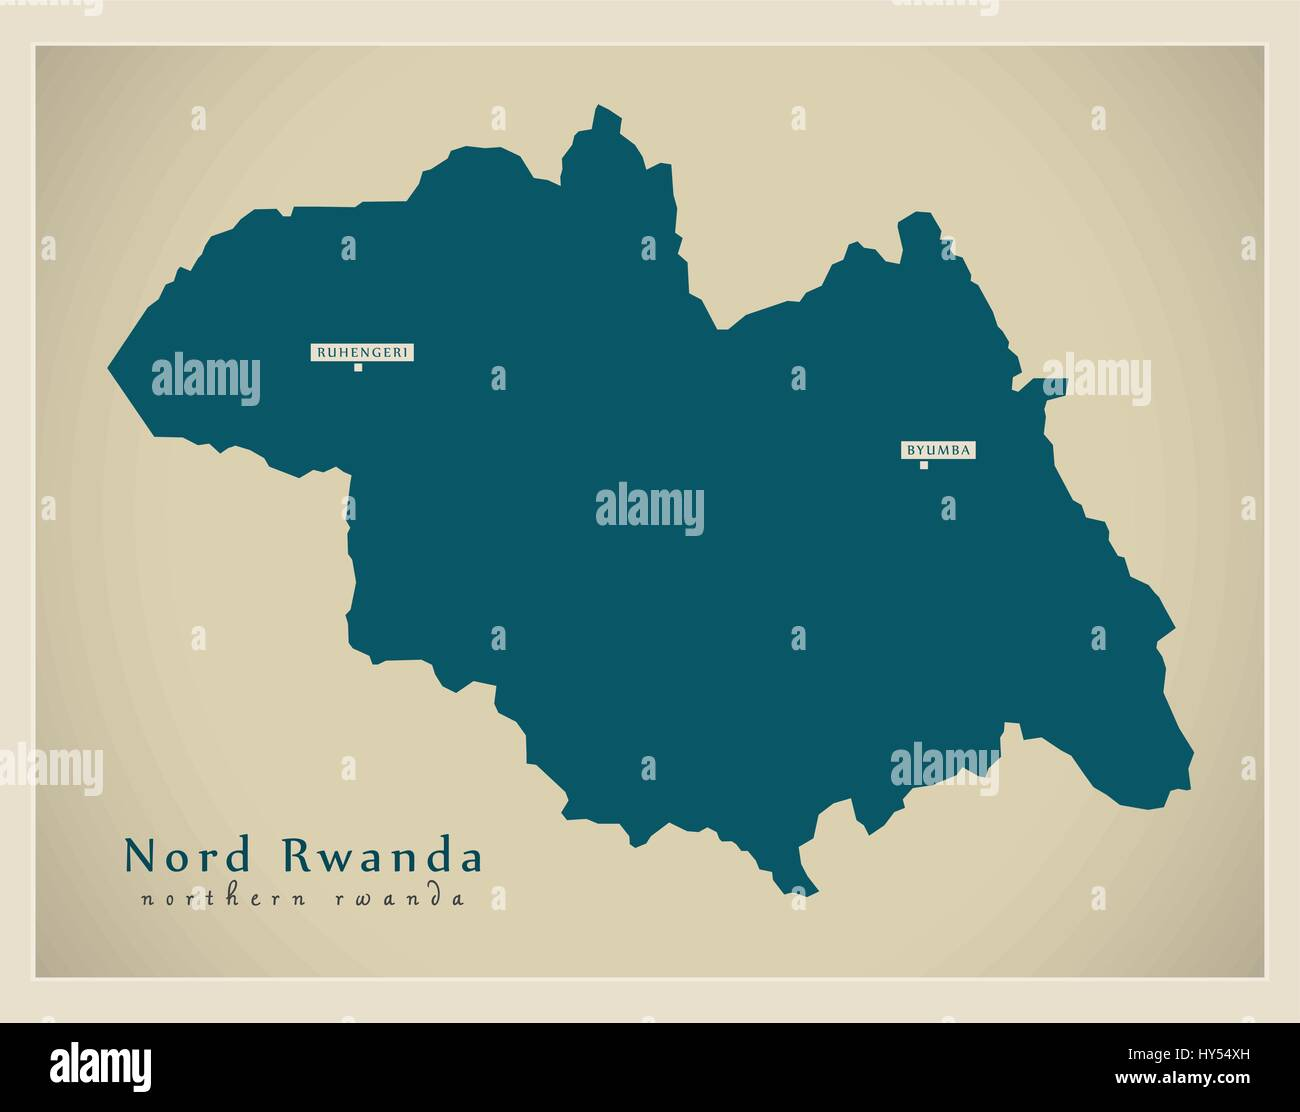 Modern Map - Nord Rwanda RW - Stock Vector